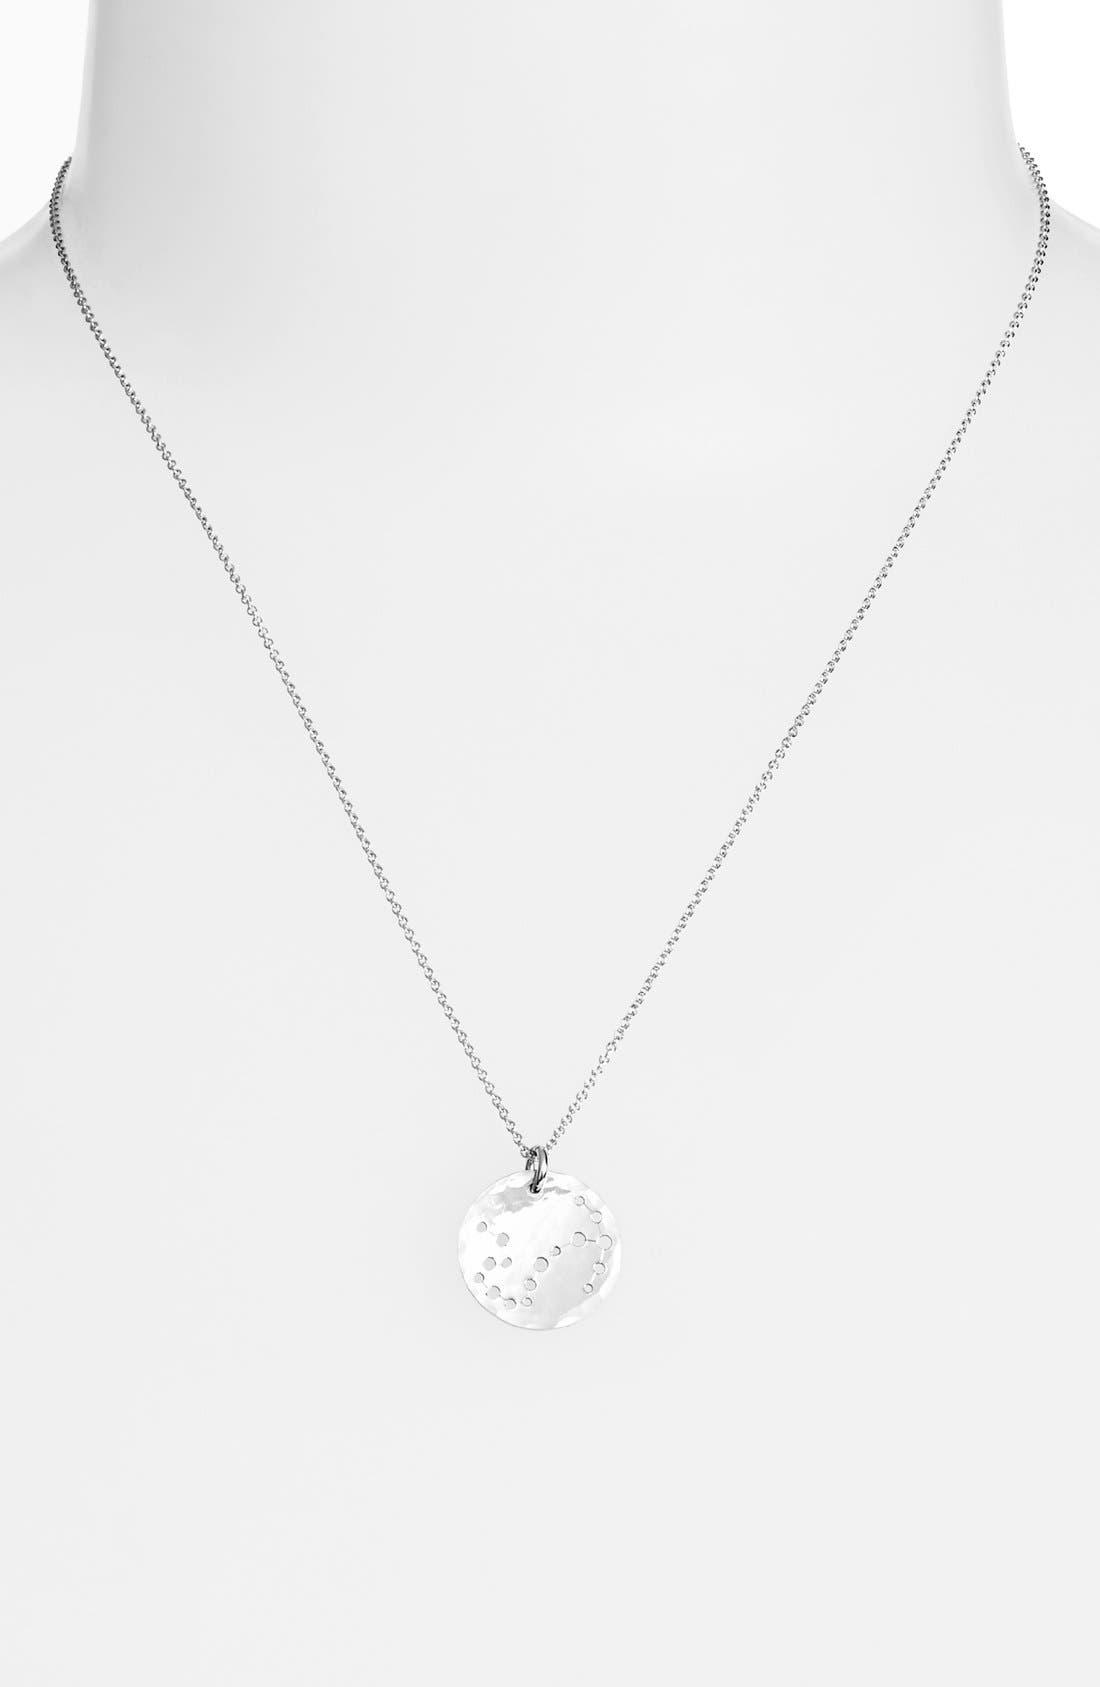 Ija 'Small Zodiac' Sterling Silver Necklace,                             Main thumbnail 8, color,